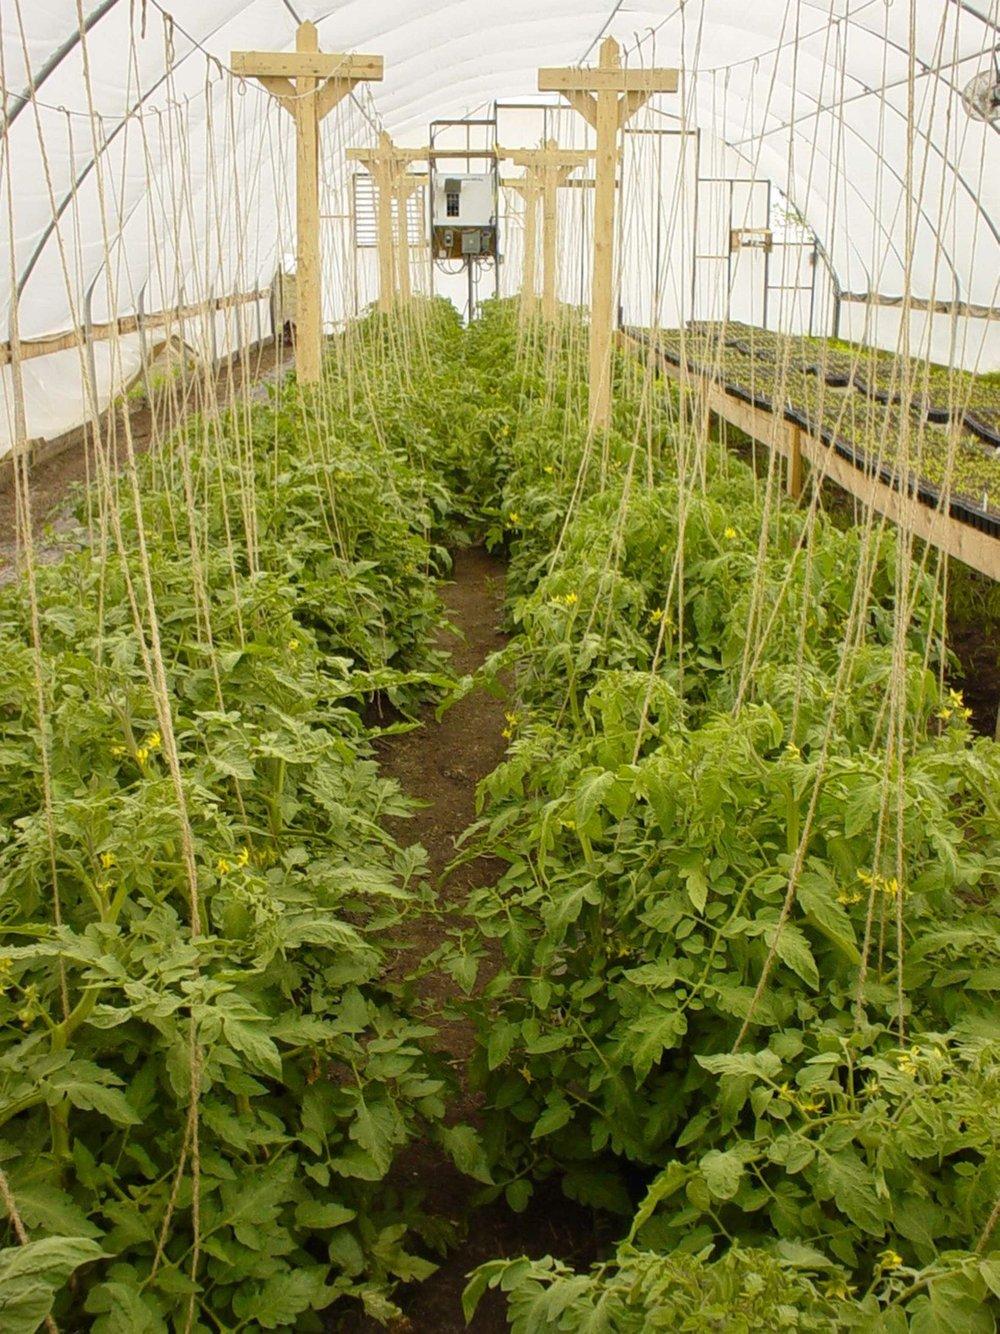 (Organic) tomatoes in a greenhouse at Maharishi Vedic City Organic Farm.